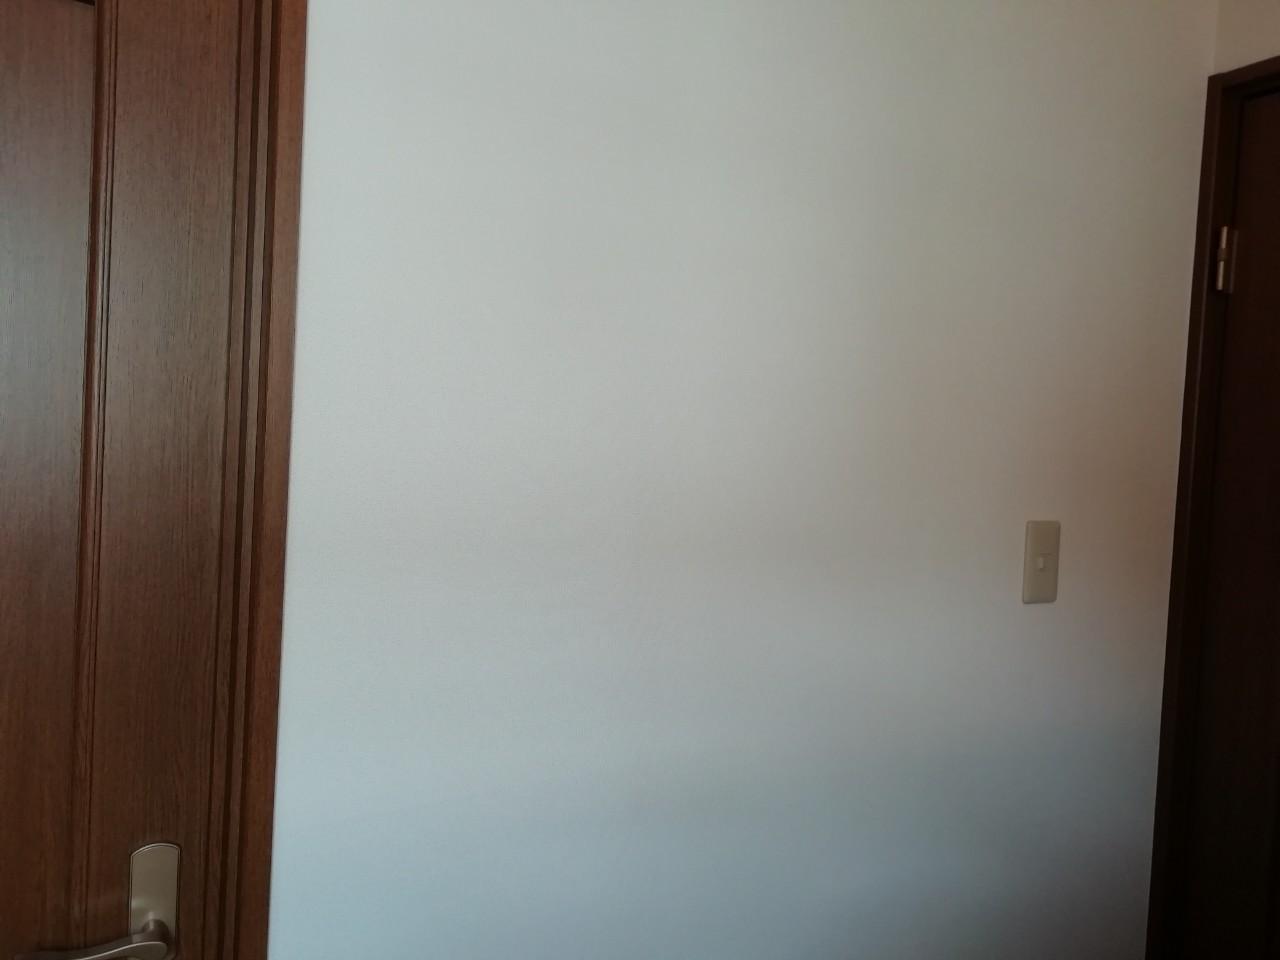 壁クロス張替え|壁穴補修|京都市北区